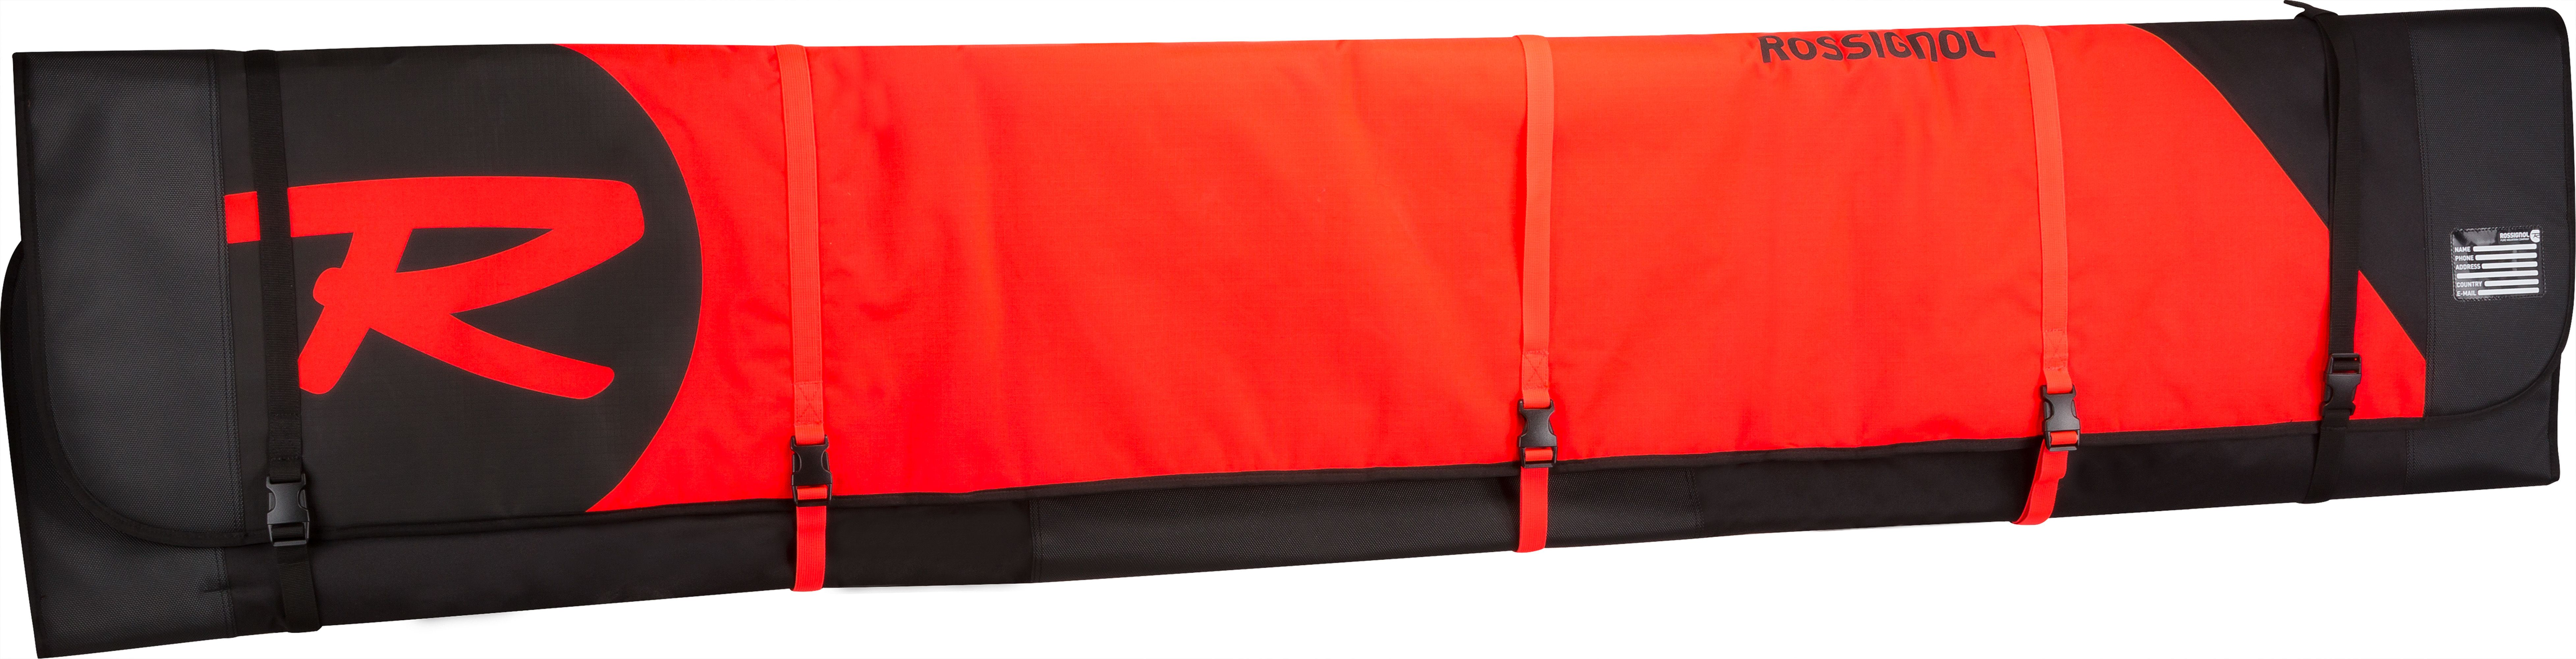 Rossignol Hero Ski Bag 4 Pairs 230cm 2020